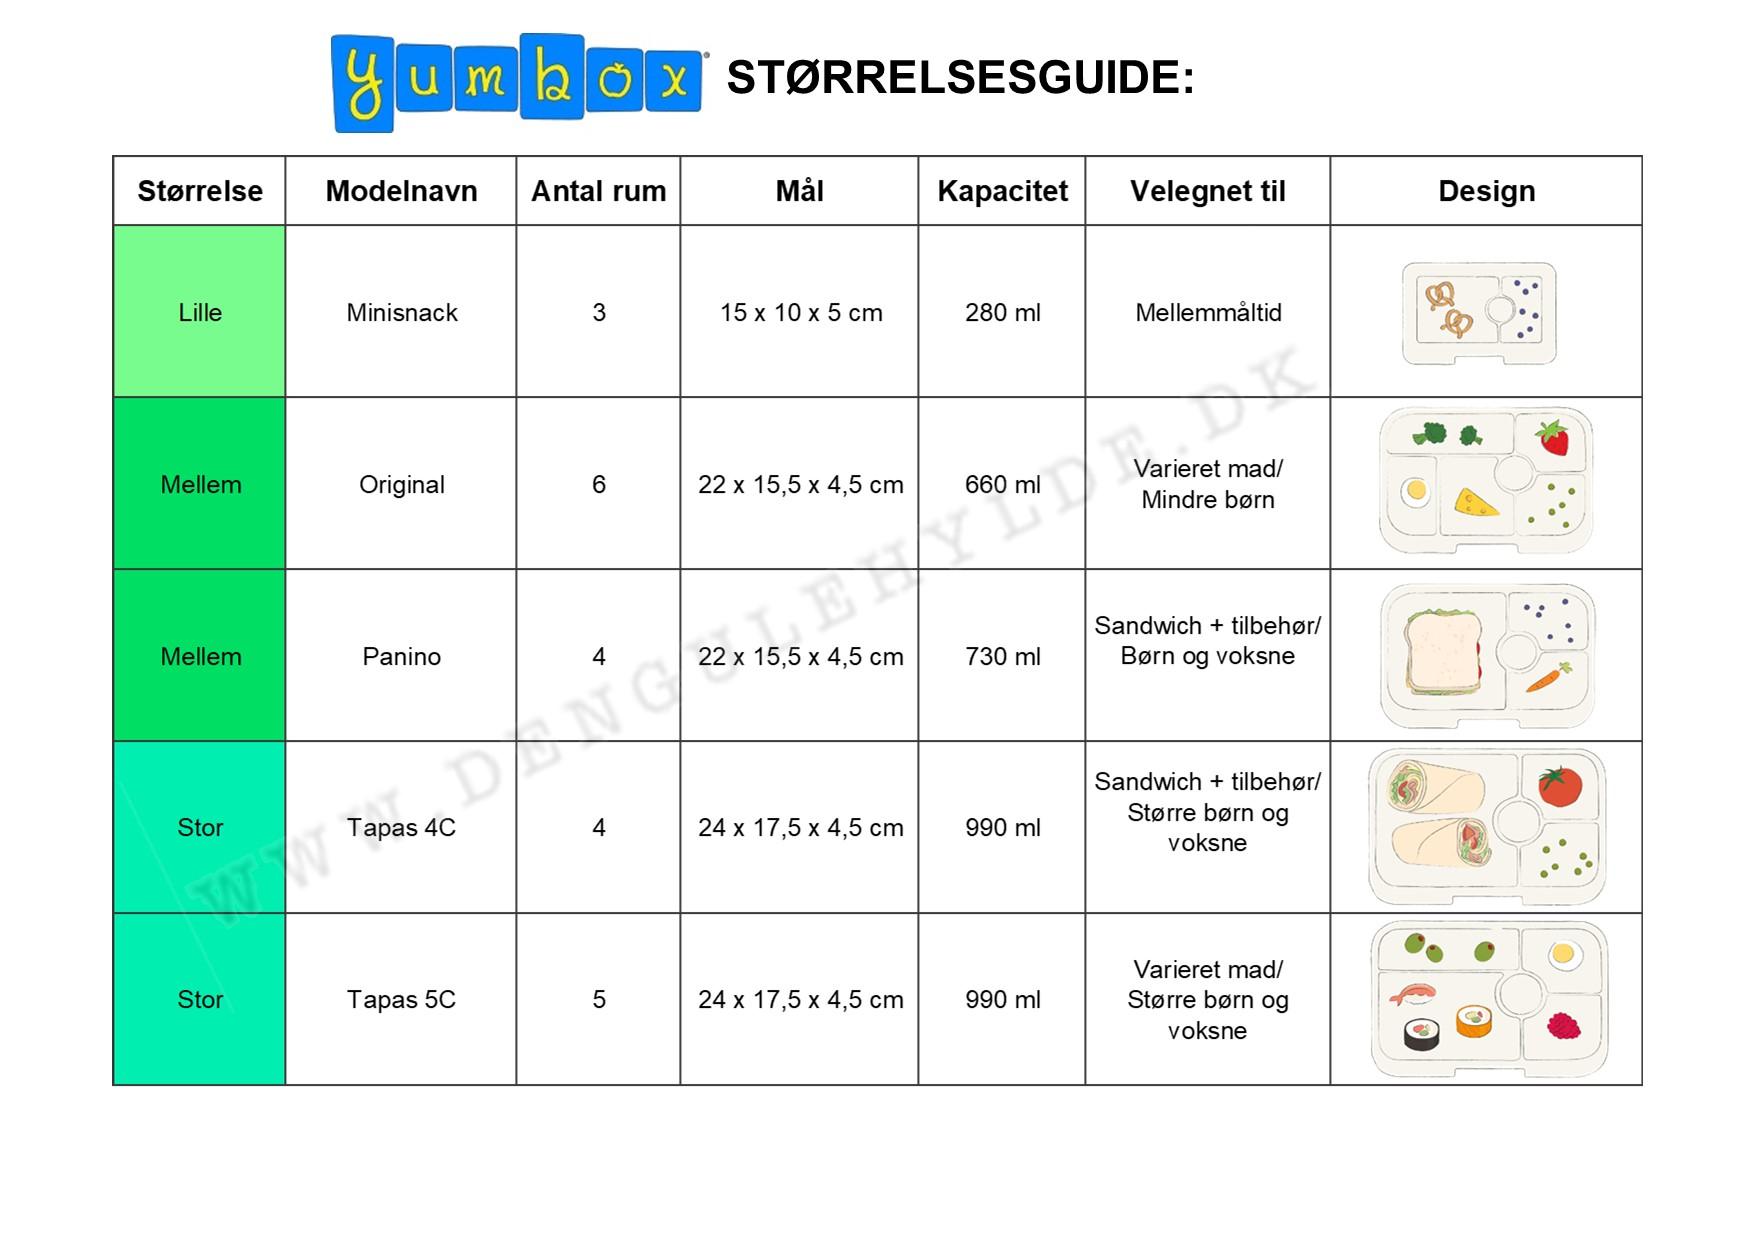 Yumbox Størrelsesguide